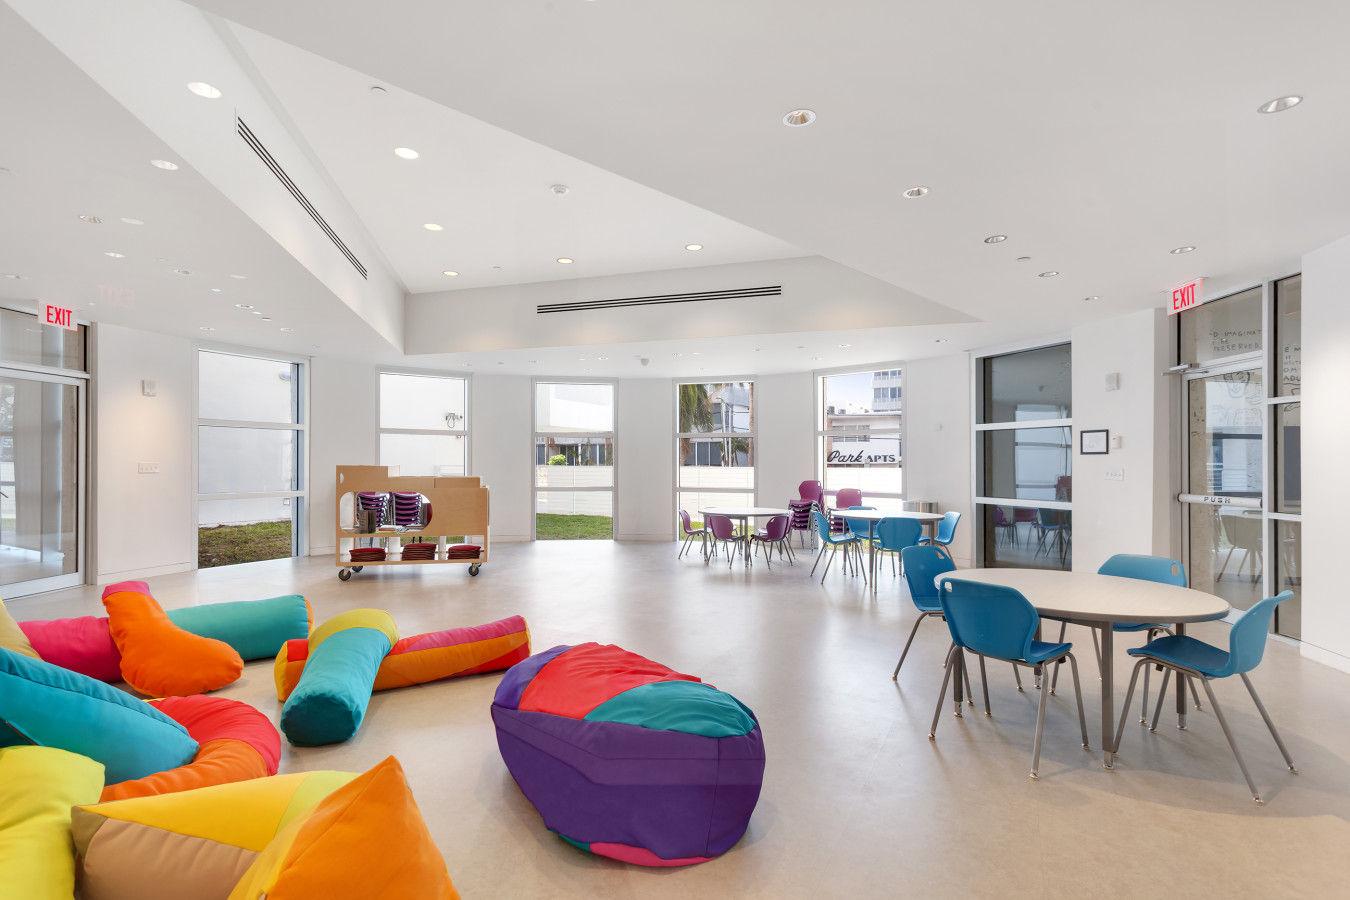 Sala de aula Rotunda